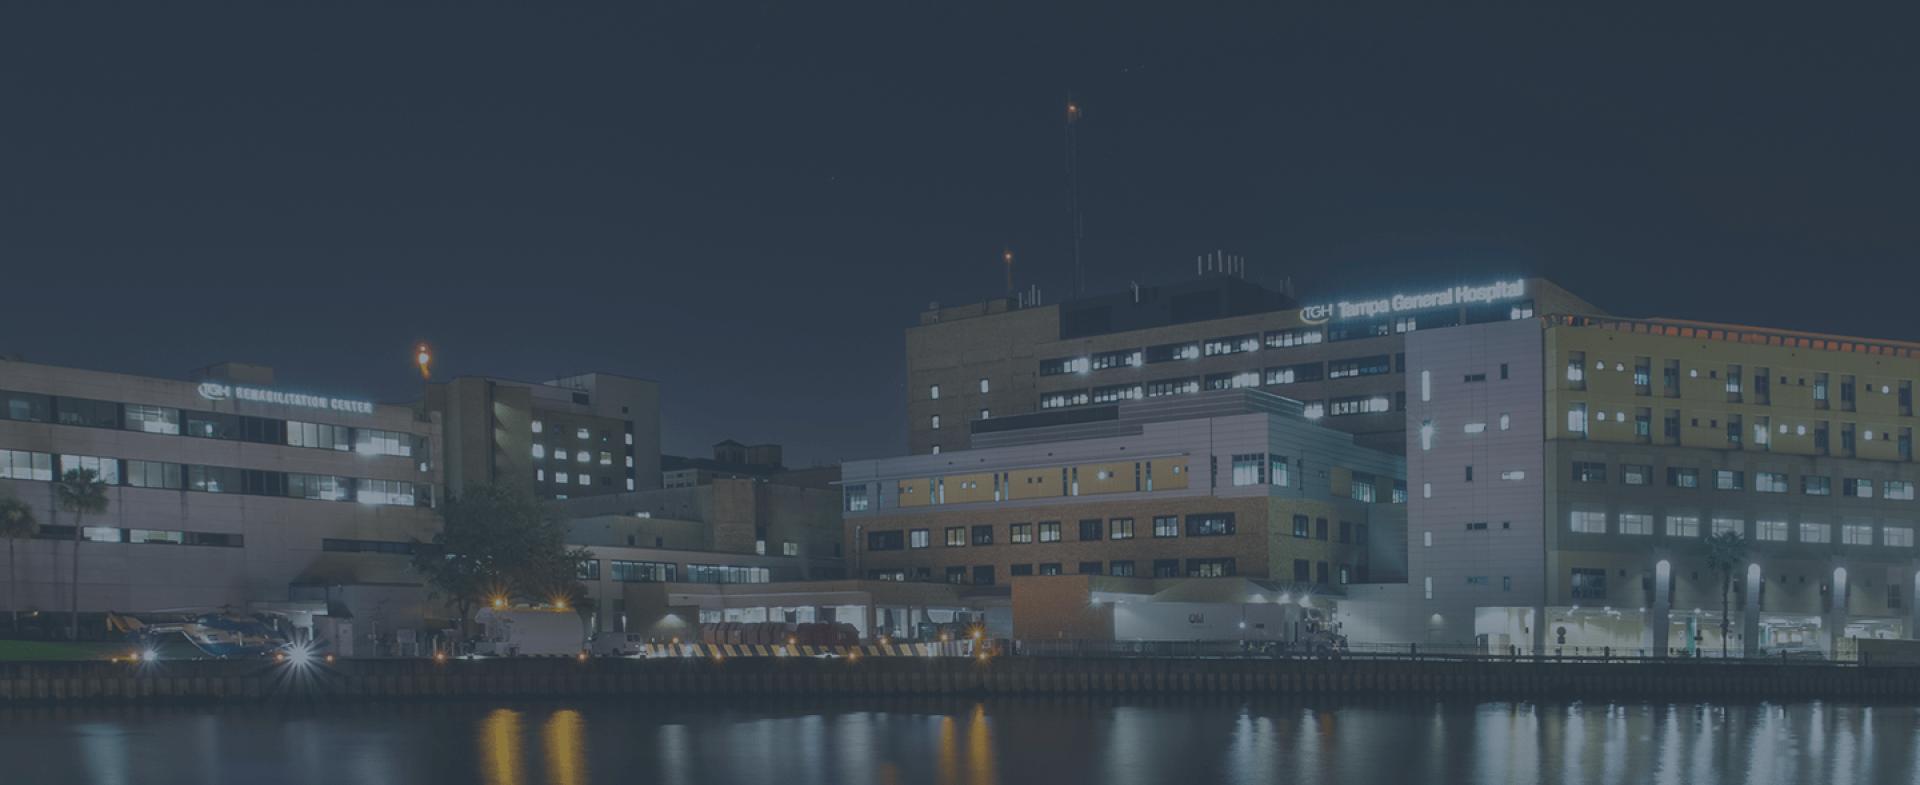 Tampa General Hospital at dusk